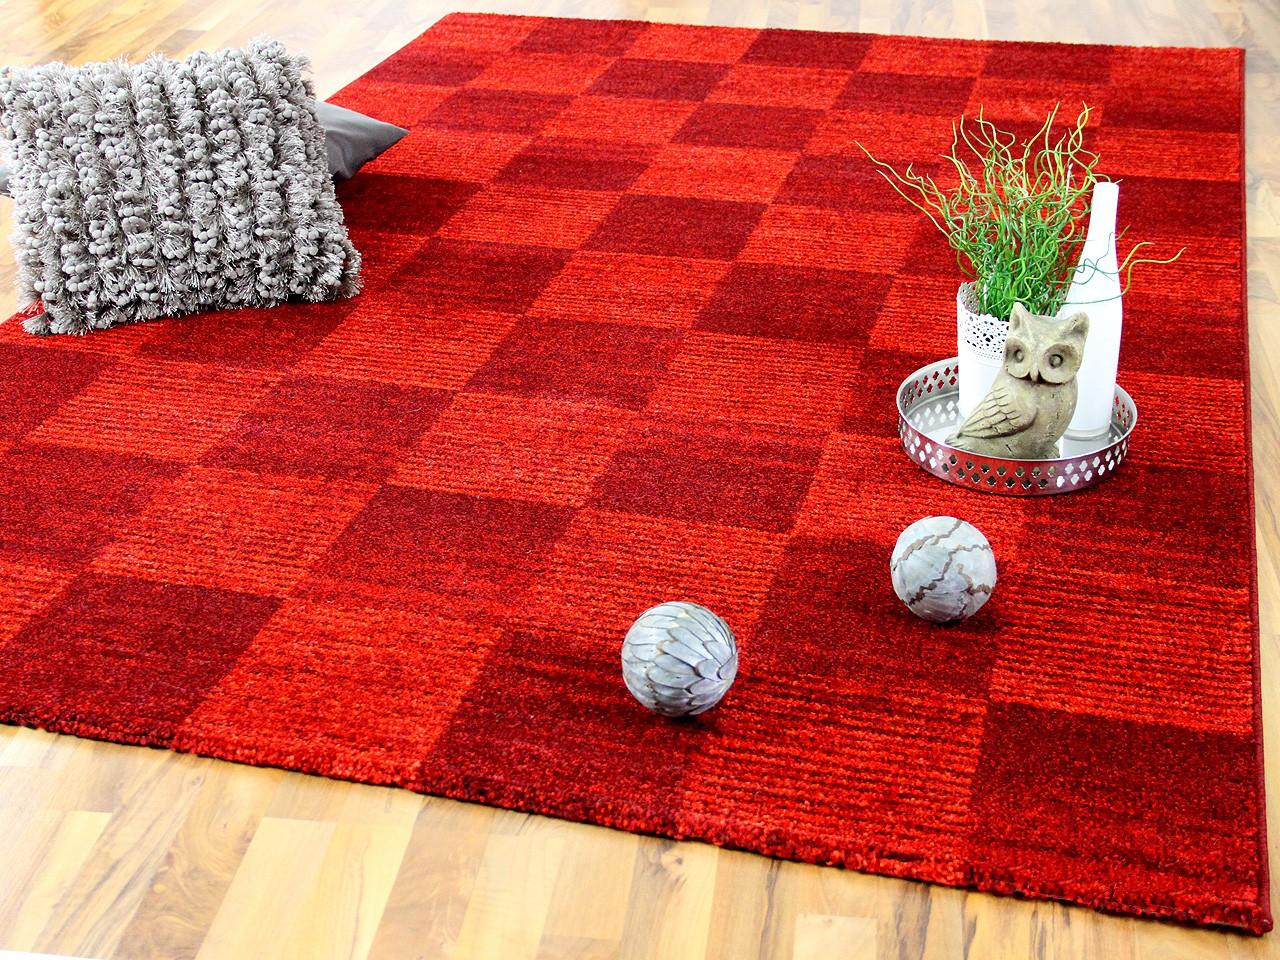 designer teppich faro rot karo sonderaktion ebay. Black Bedroom Furniture Sets. Home Design Ideas